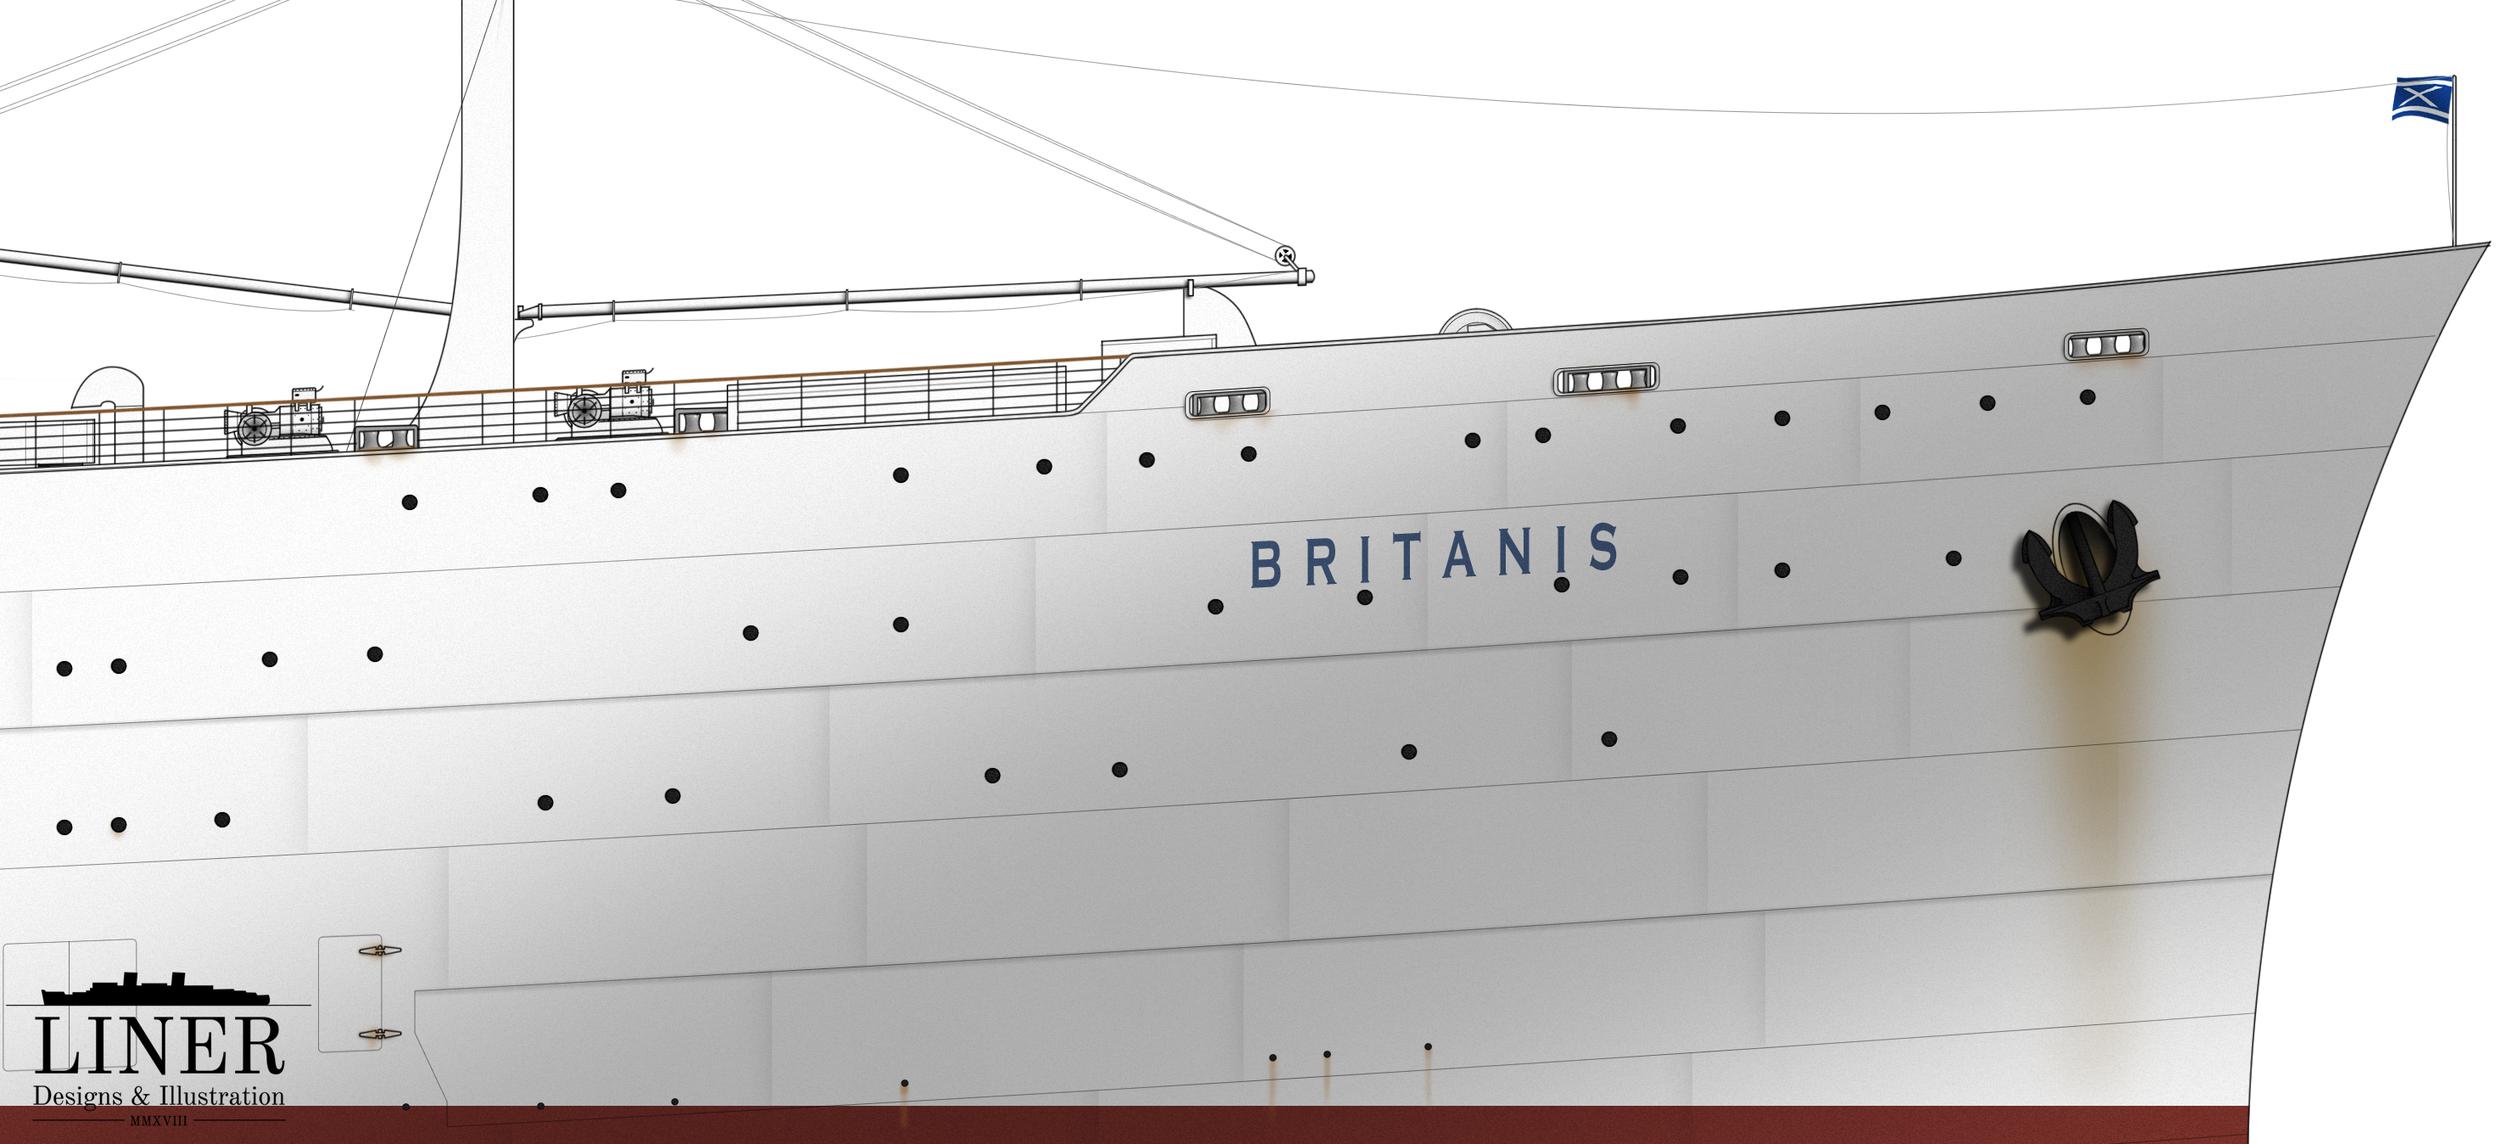 Britanis' imposing and distinctive bow.